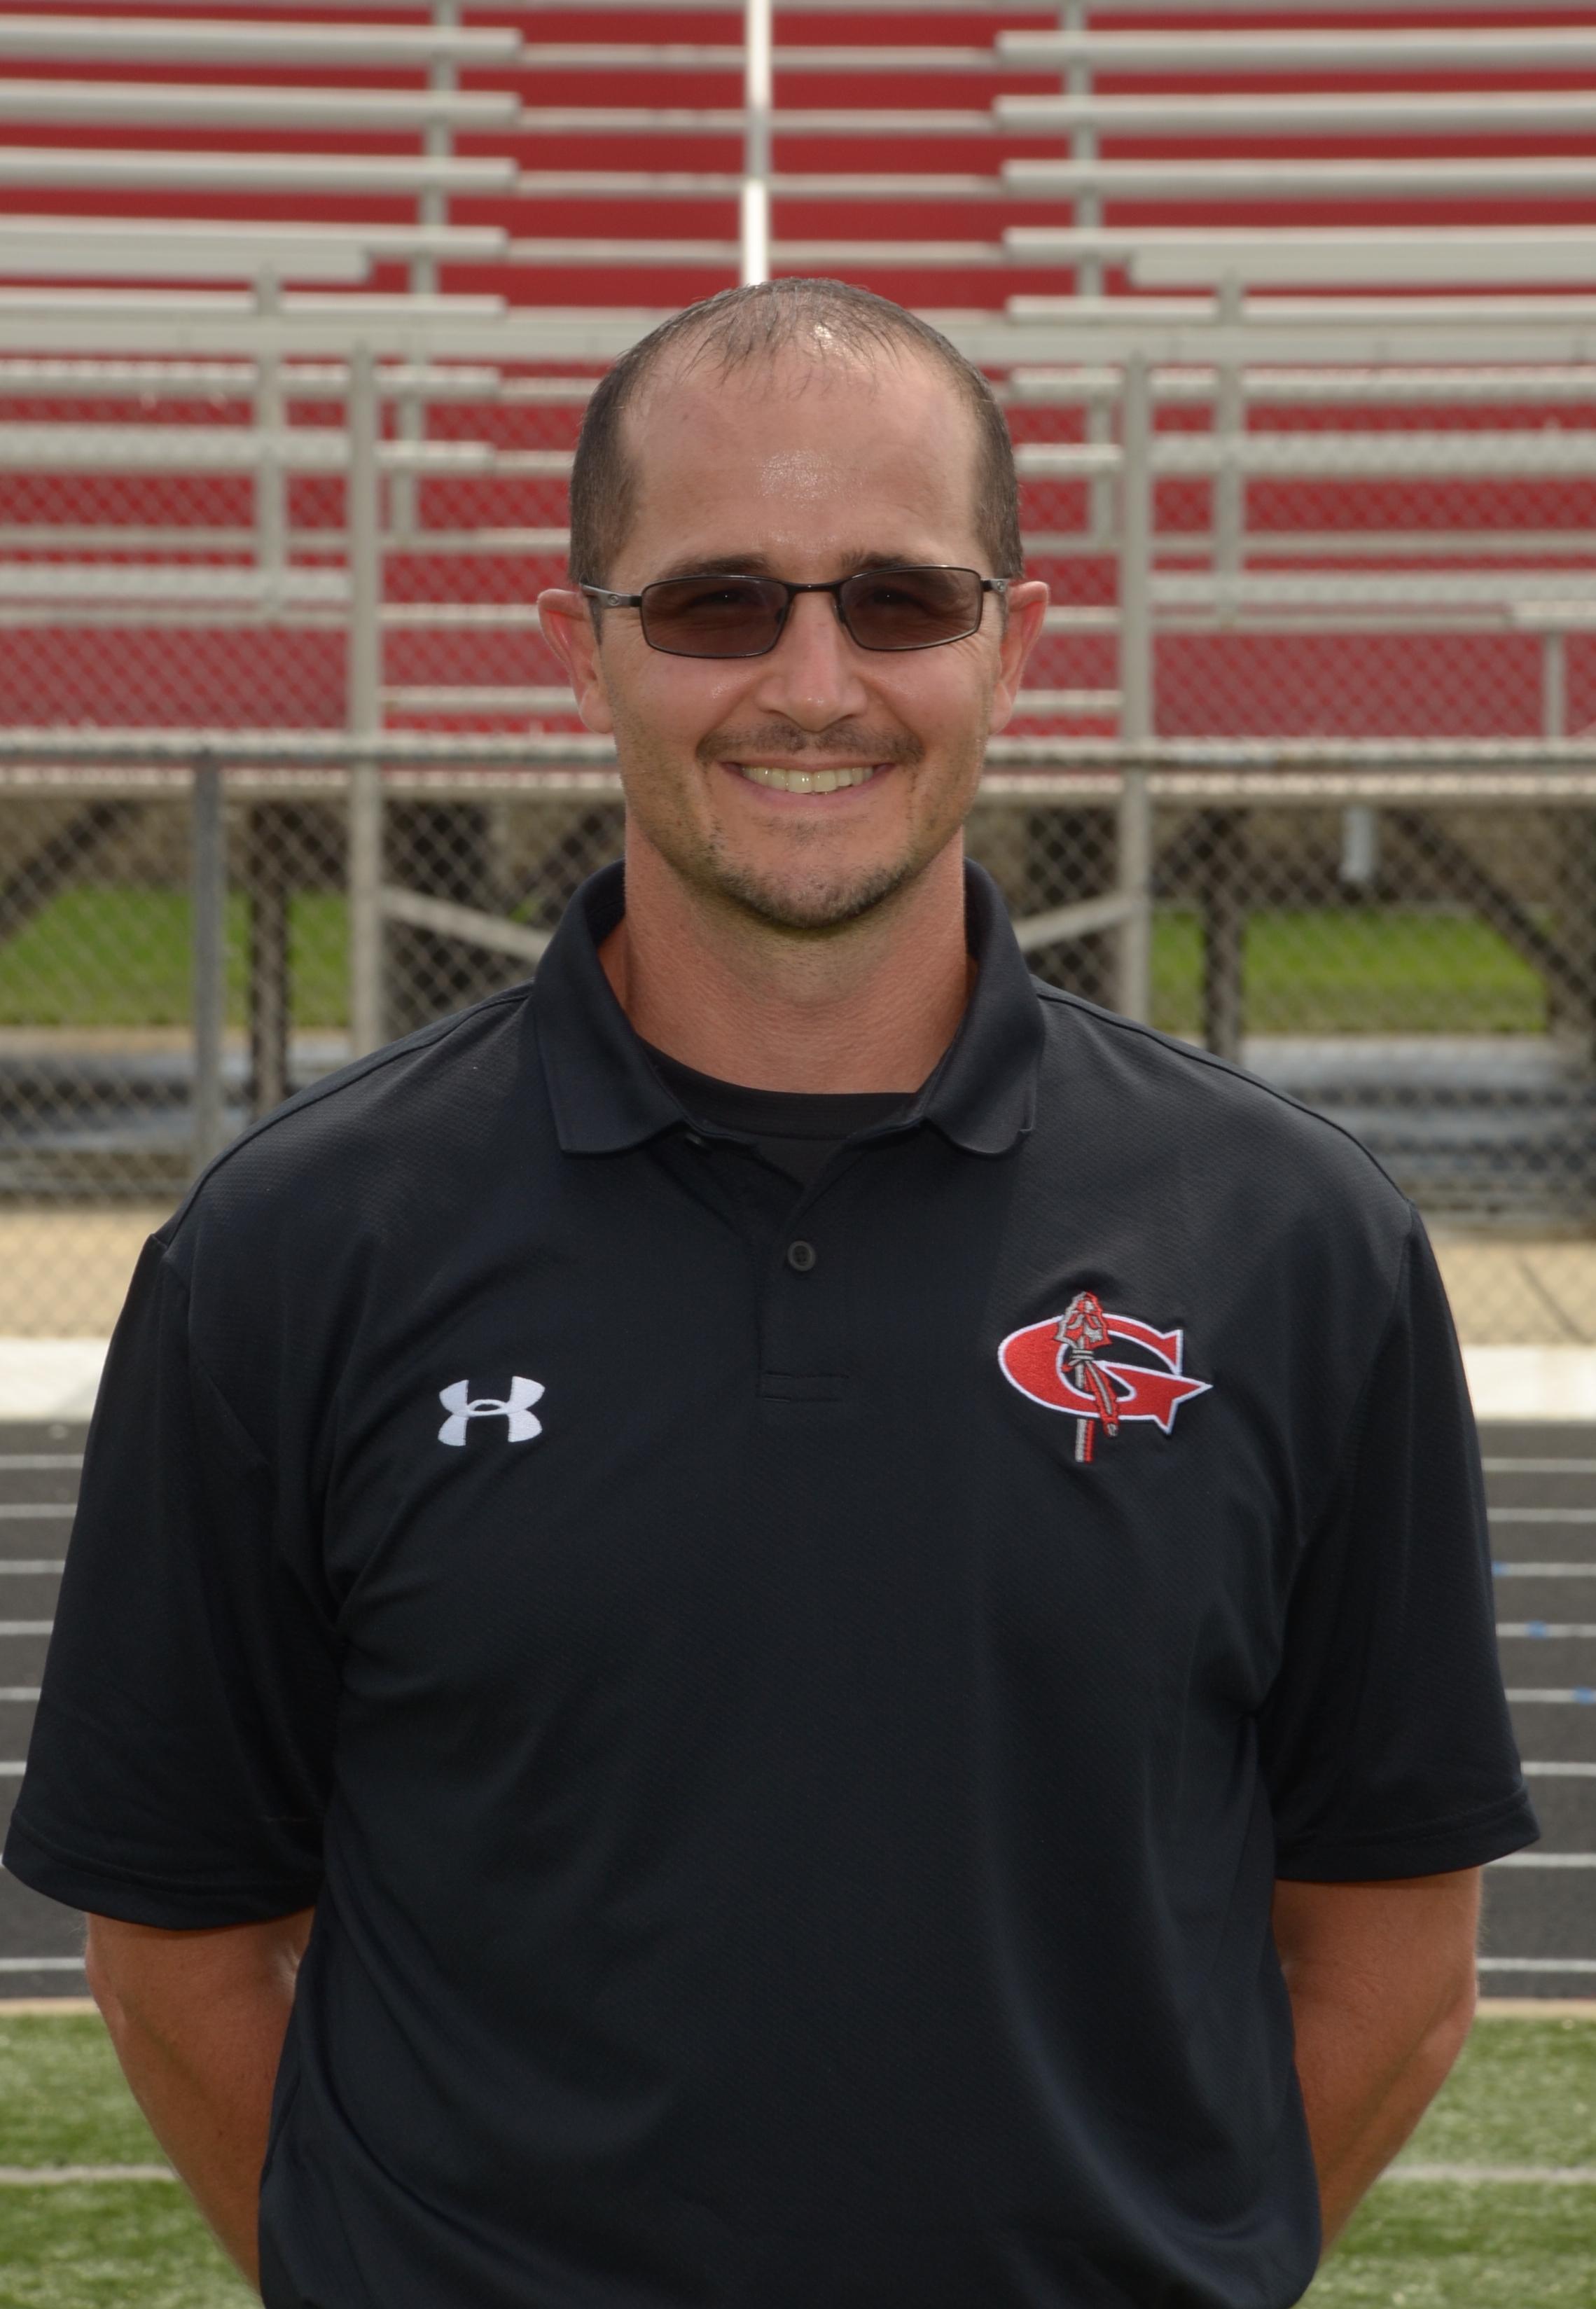 Coach Metz